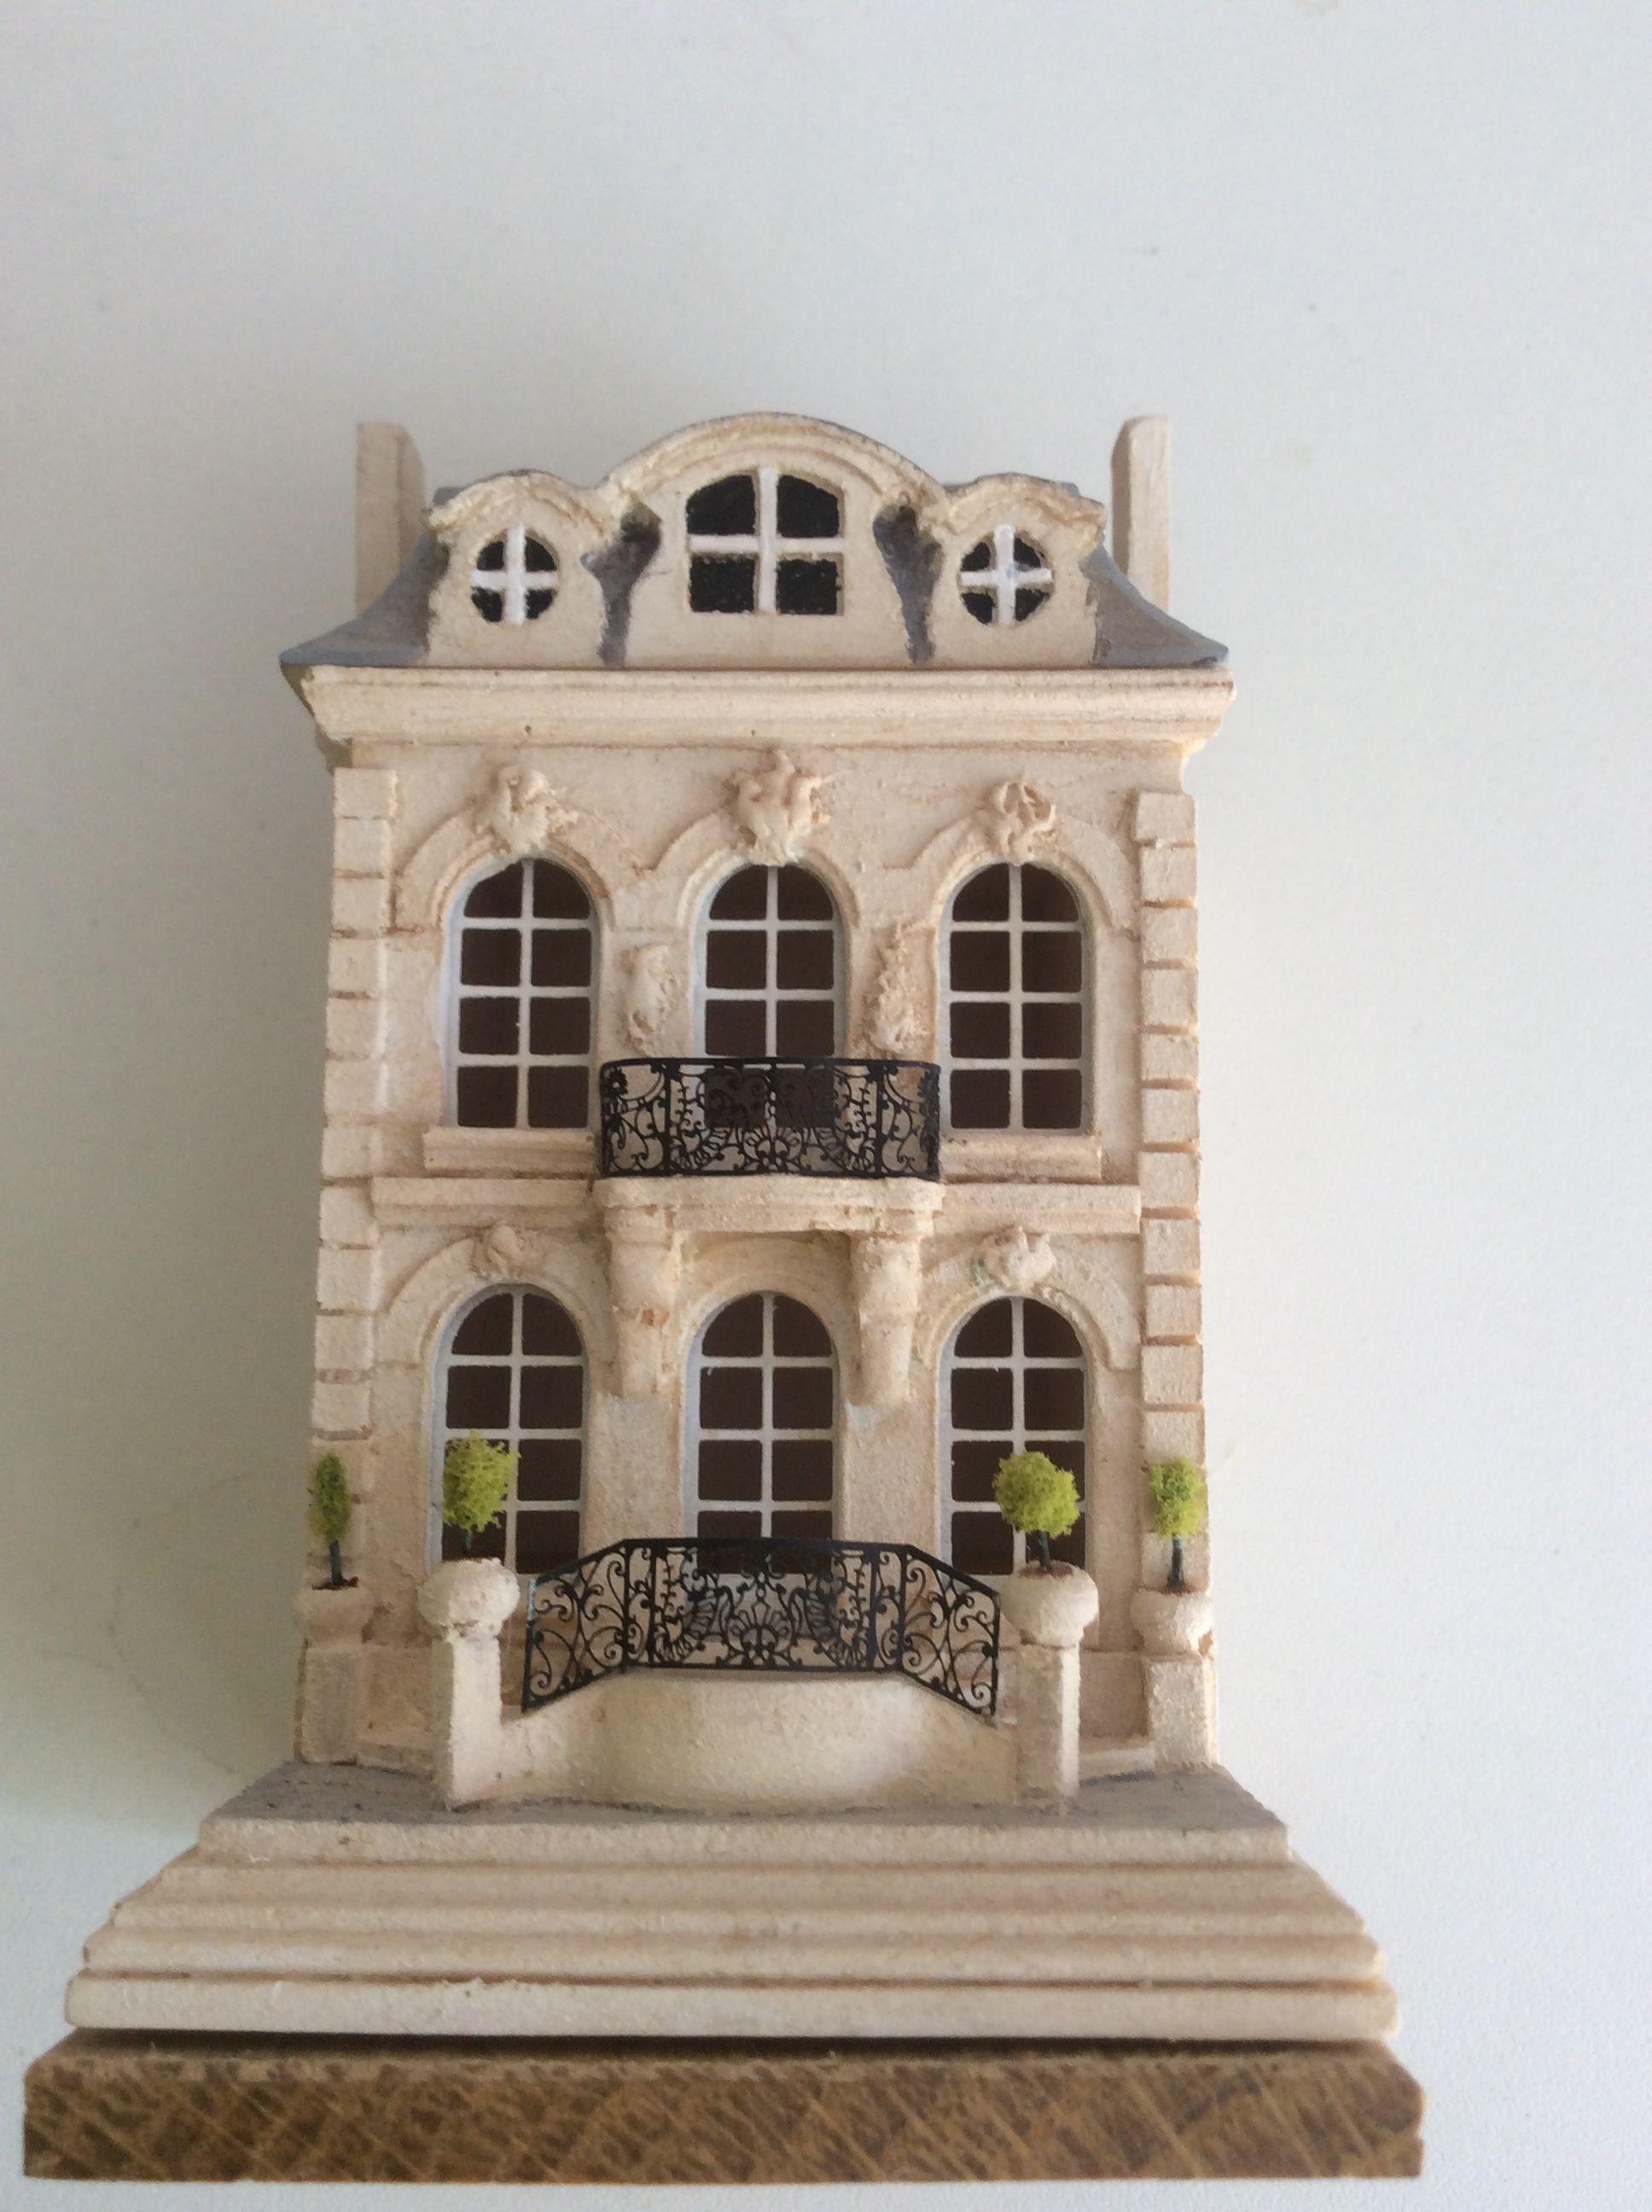 A Modelroom house by Robert Dawson Miniature rooms